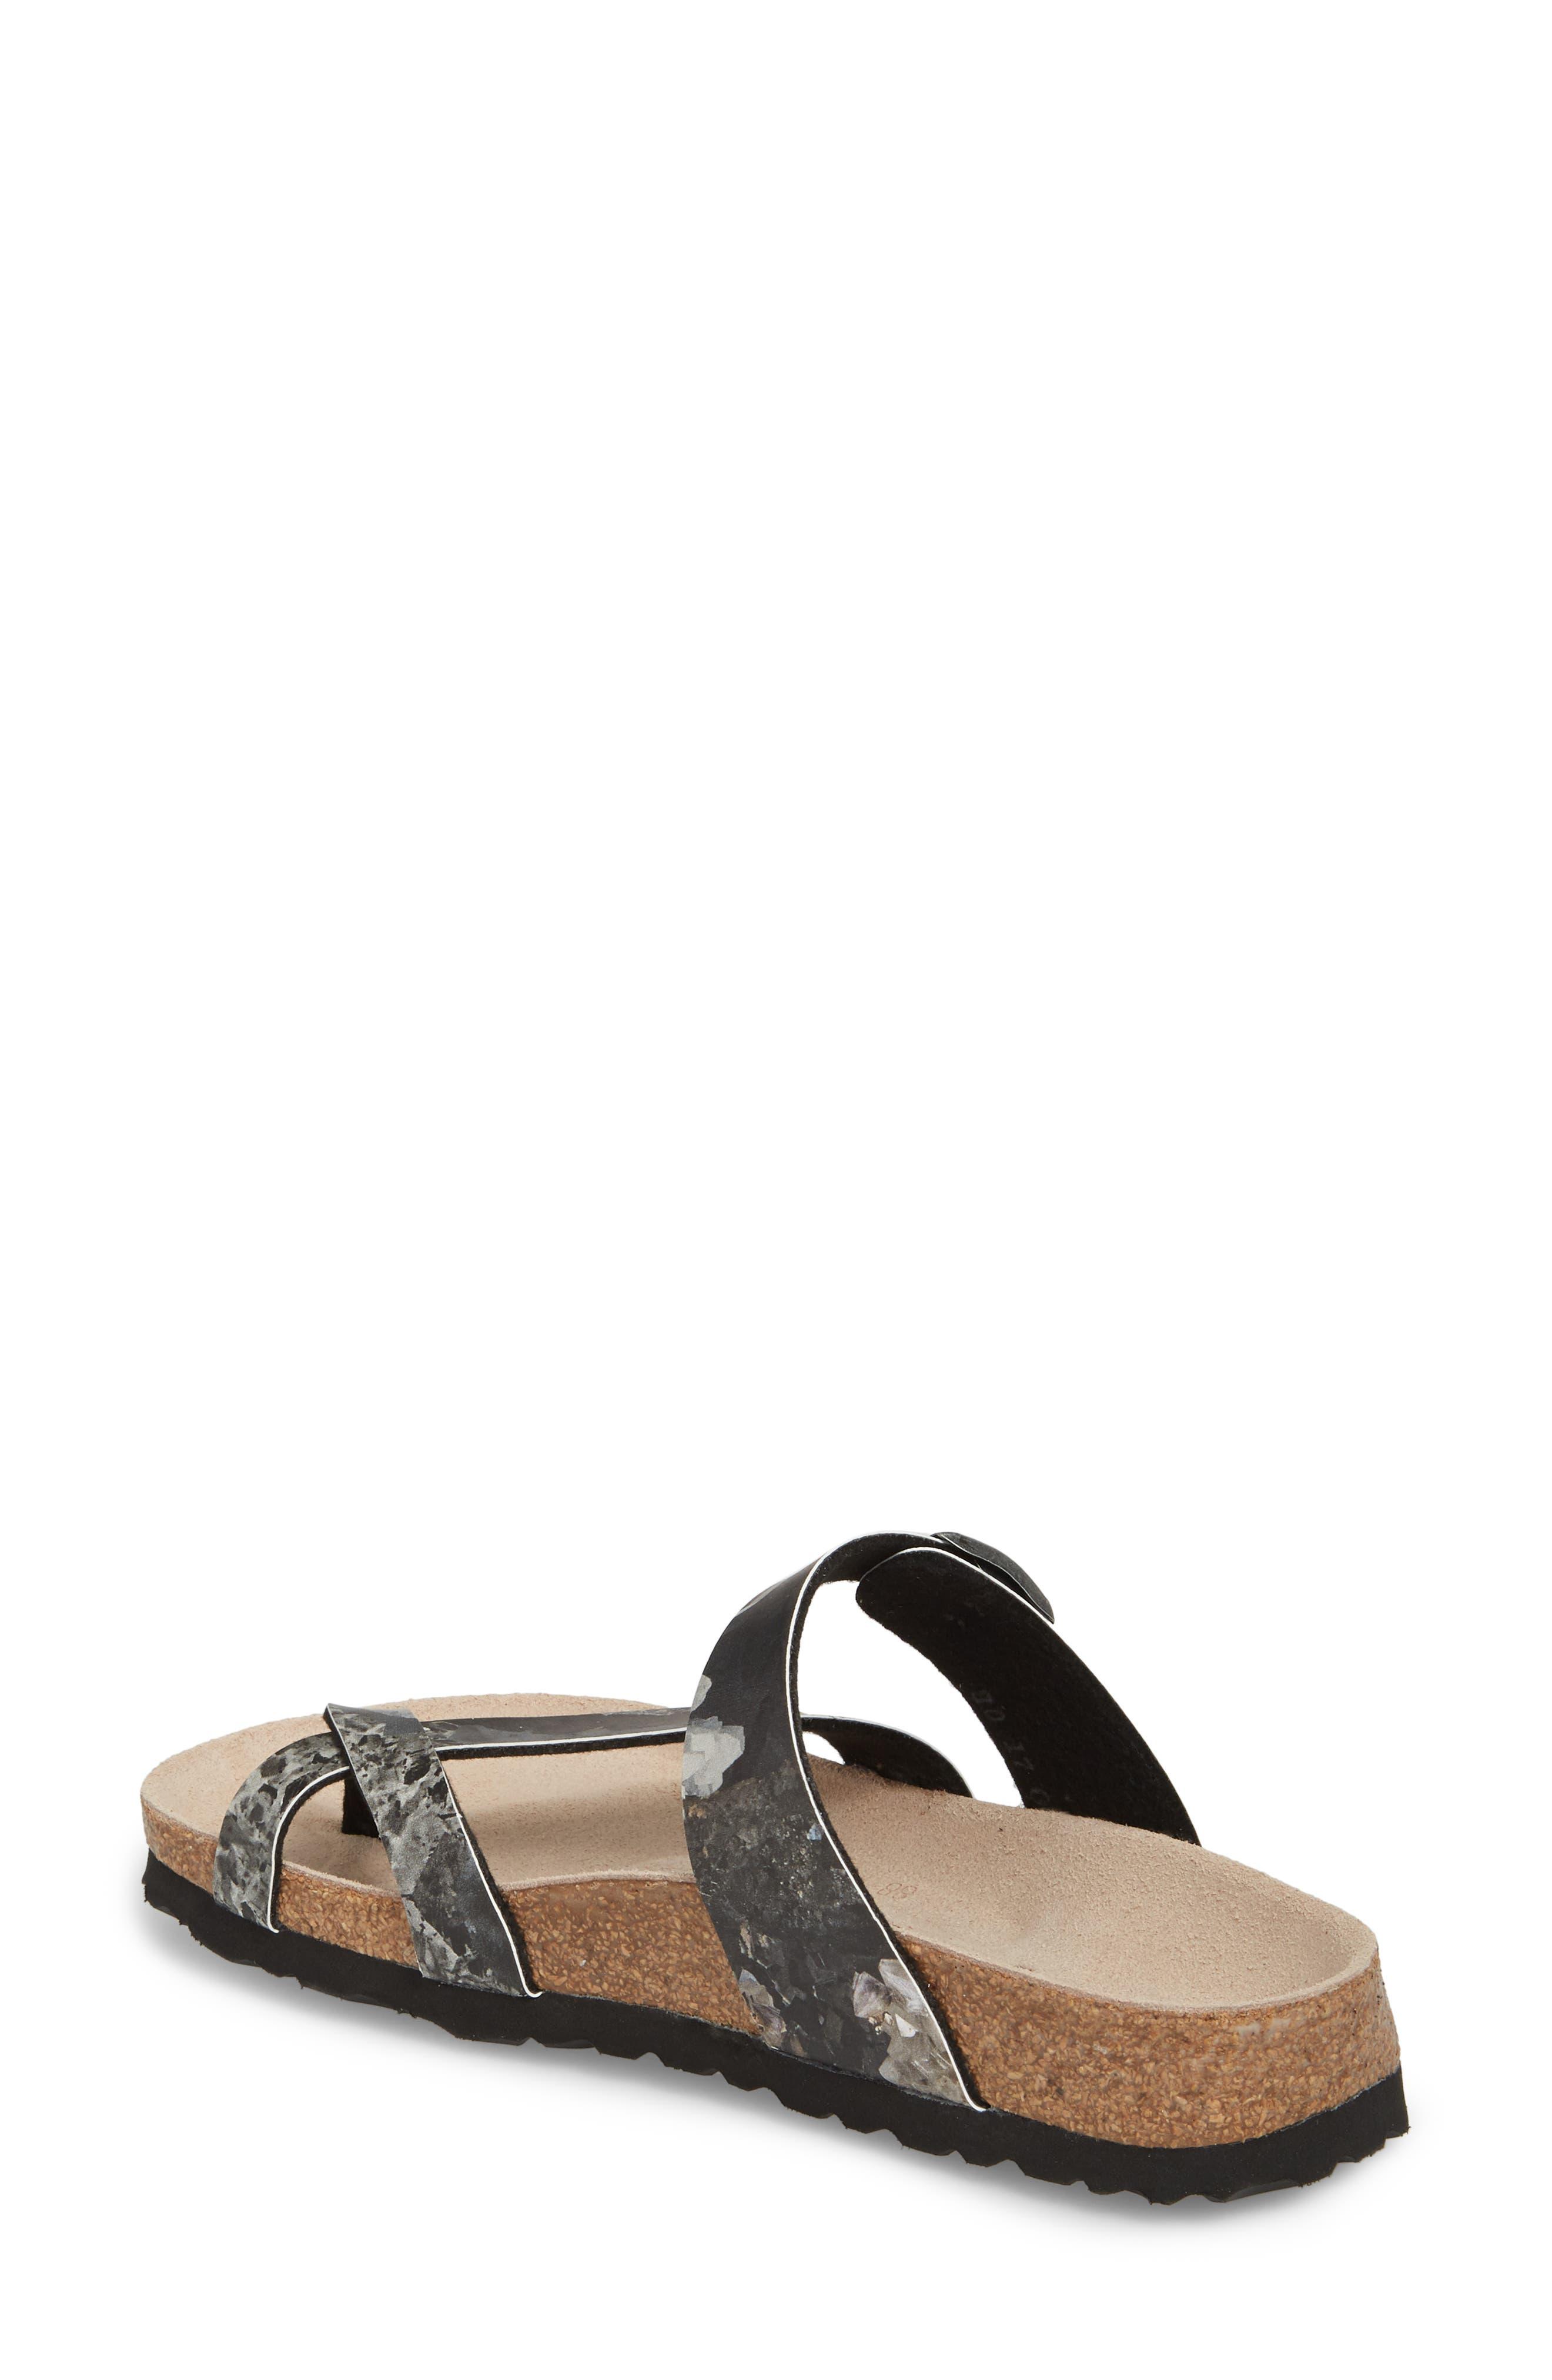 Papillio by Birkenstock Tabora Birko-Flor Slide Sandal,                             Alternate thumbnail 2, color,                             Crystal Black Leather